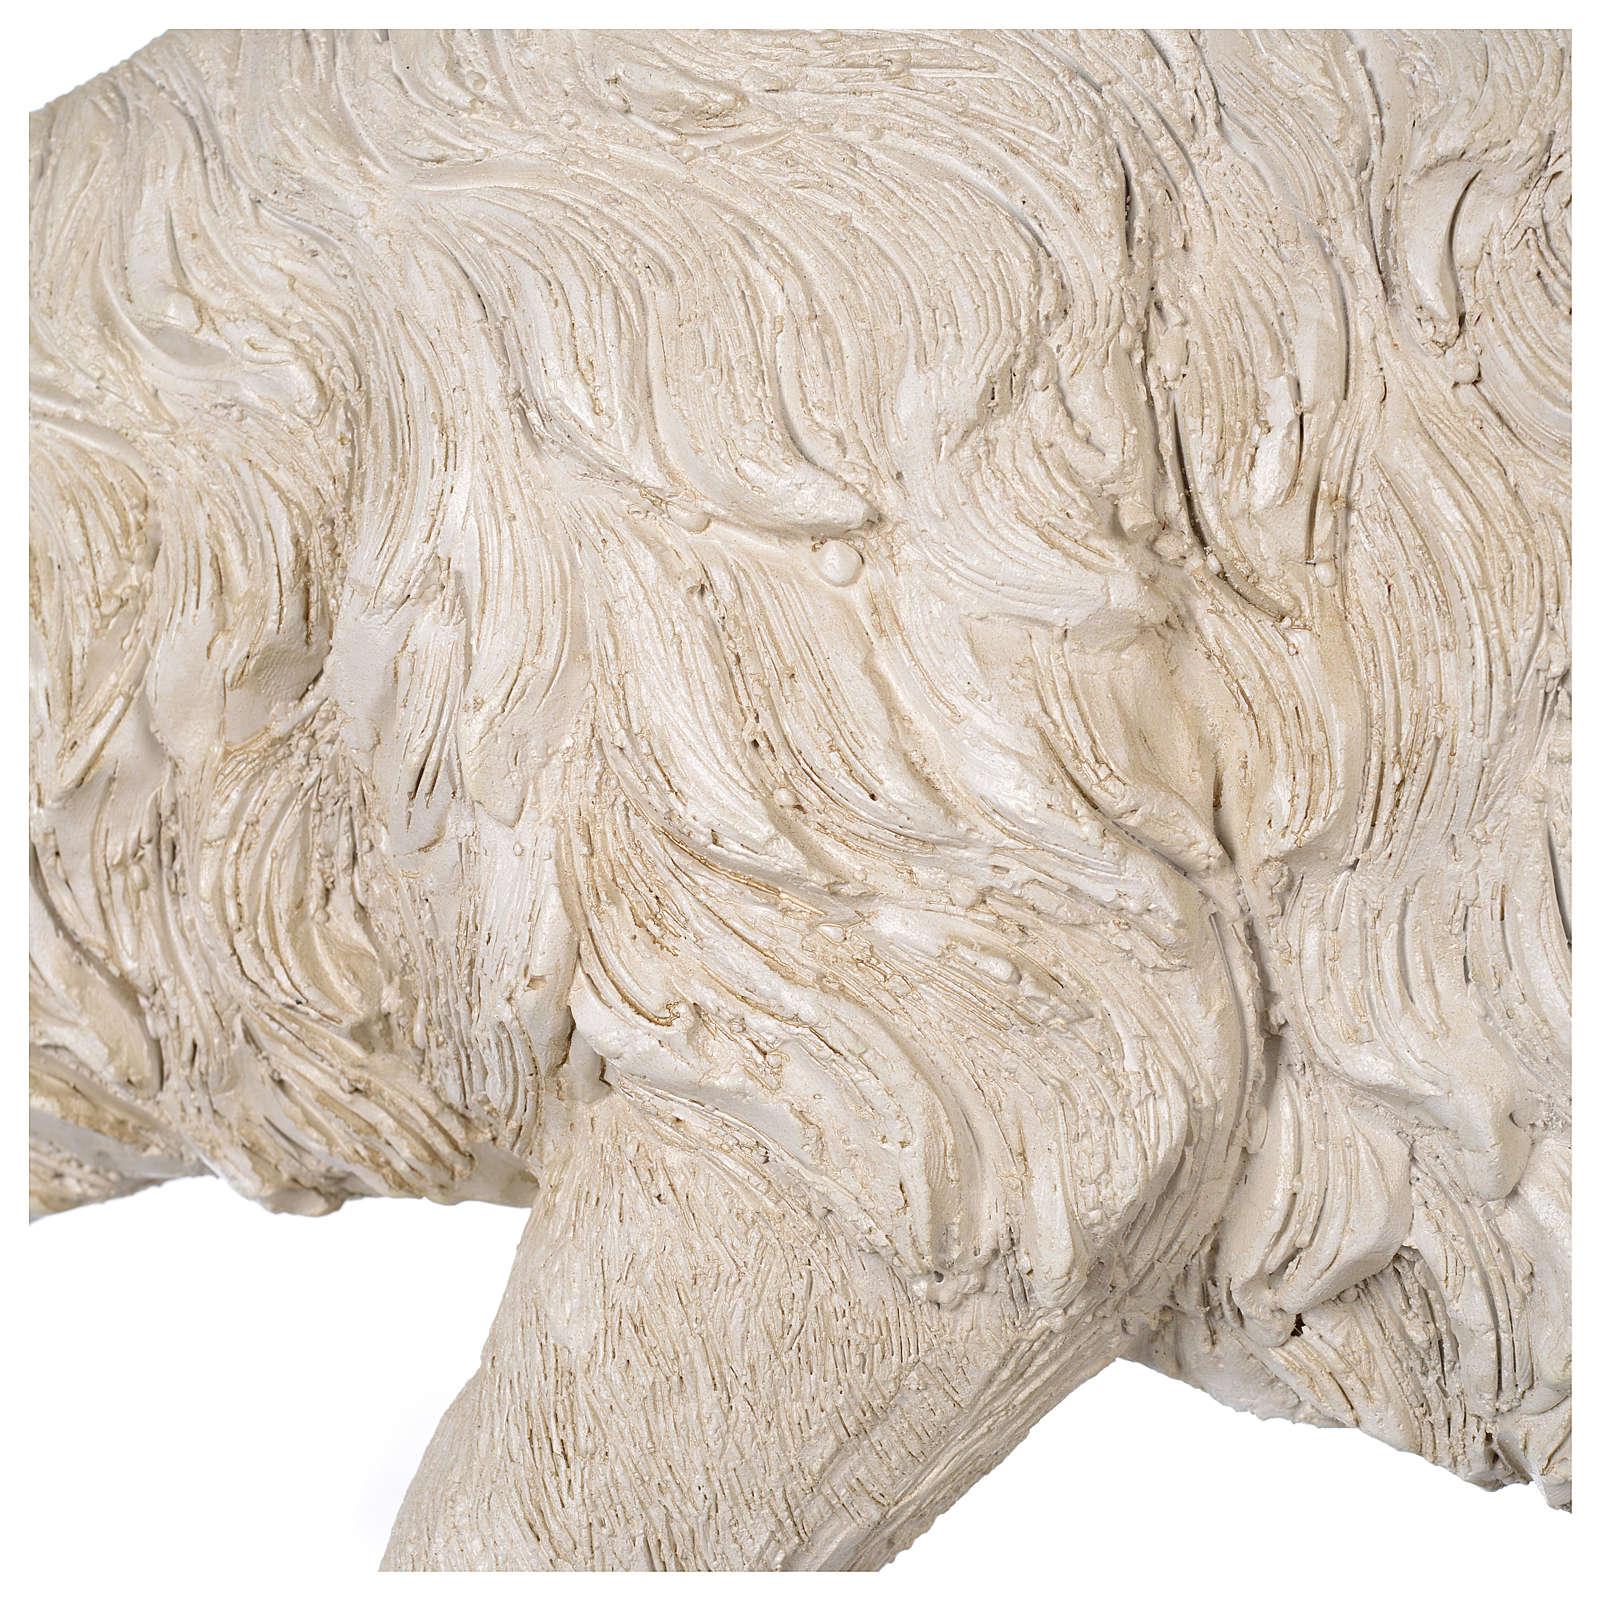 Pecora testa bassa resina presepe 80-100 cm 3